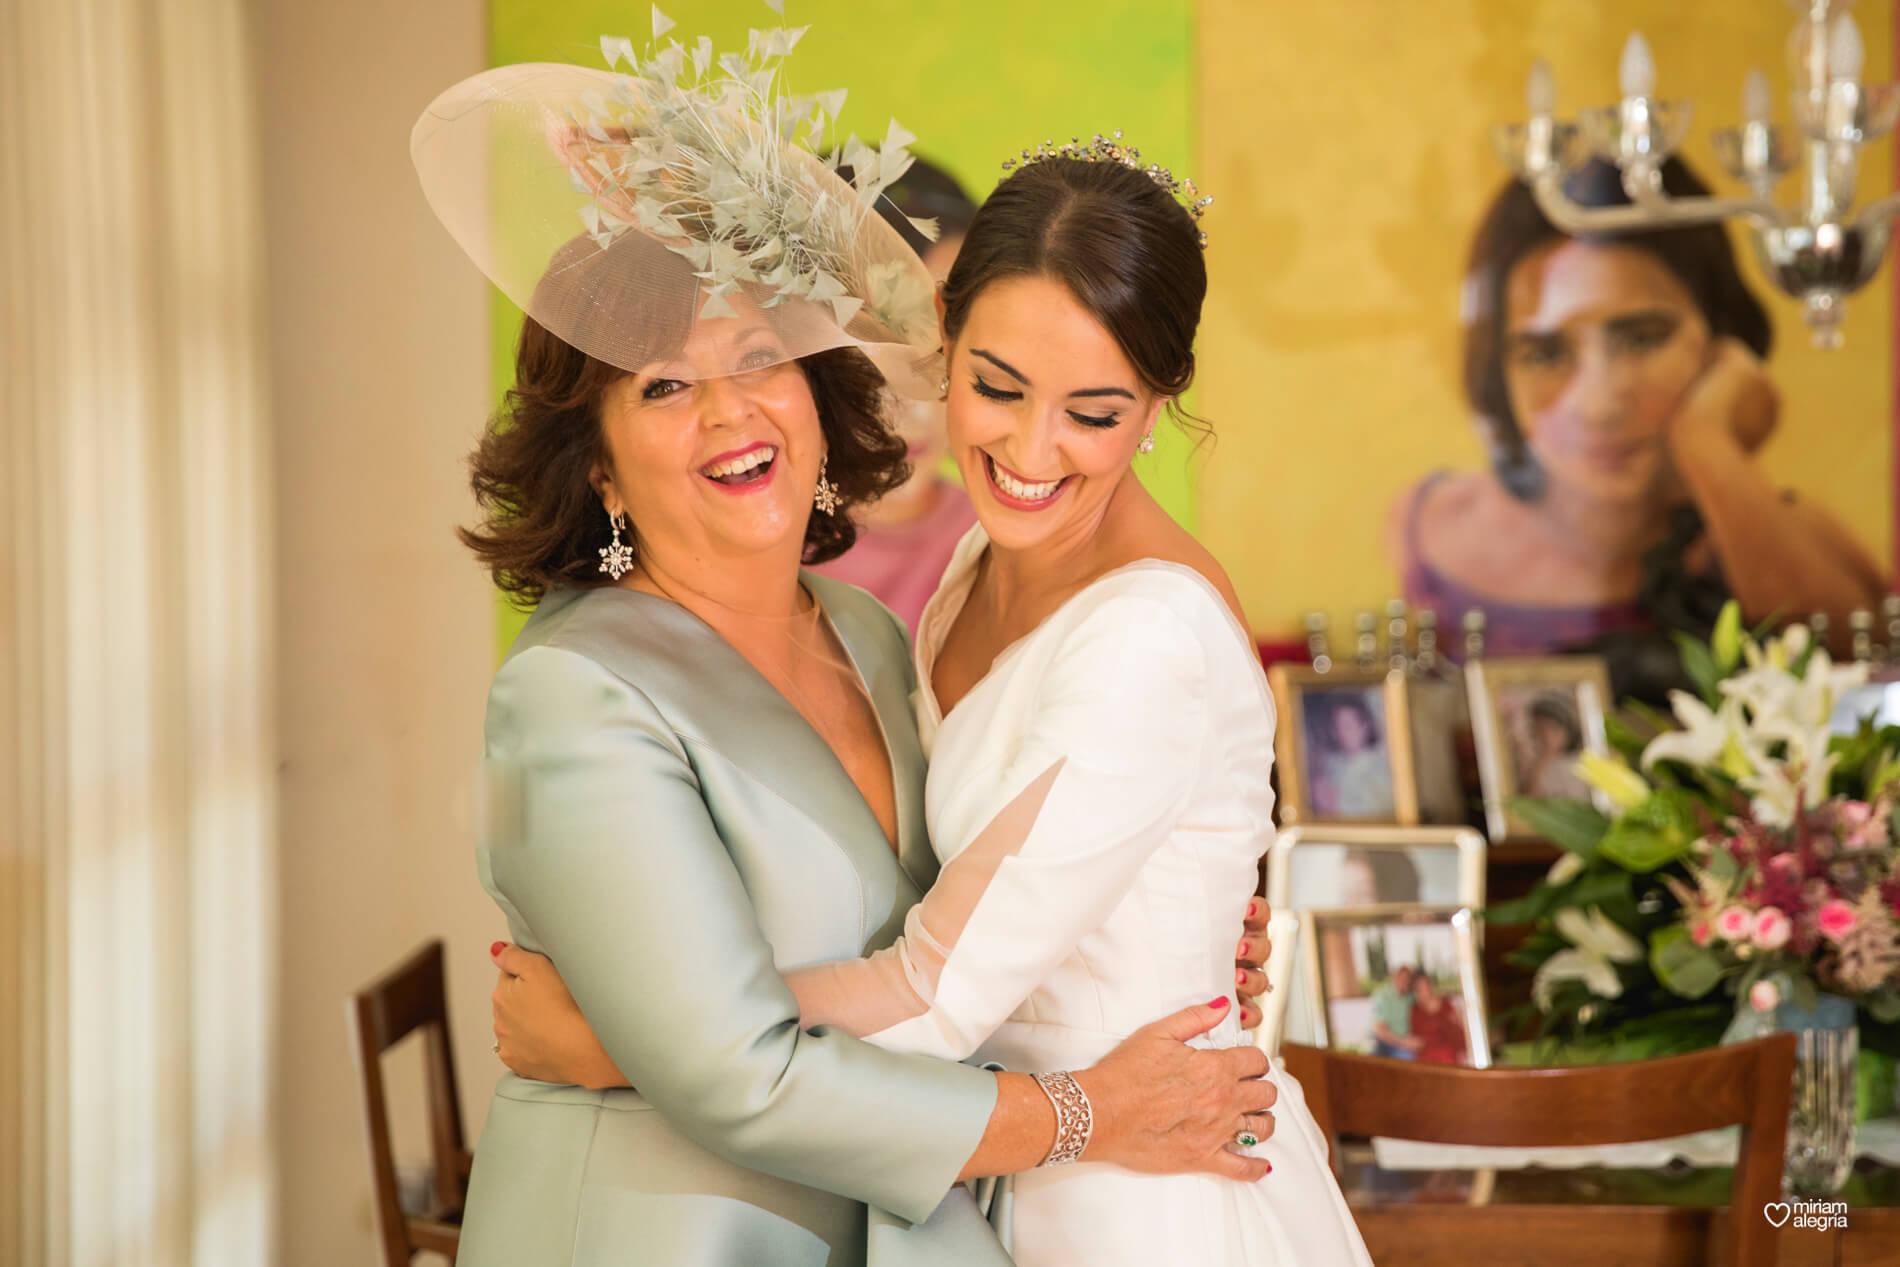 vestido-de-novia-paula-del-vas-miriam-alegria-fotografos-boda-murcia-34